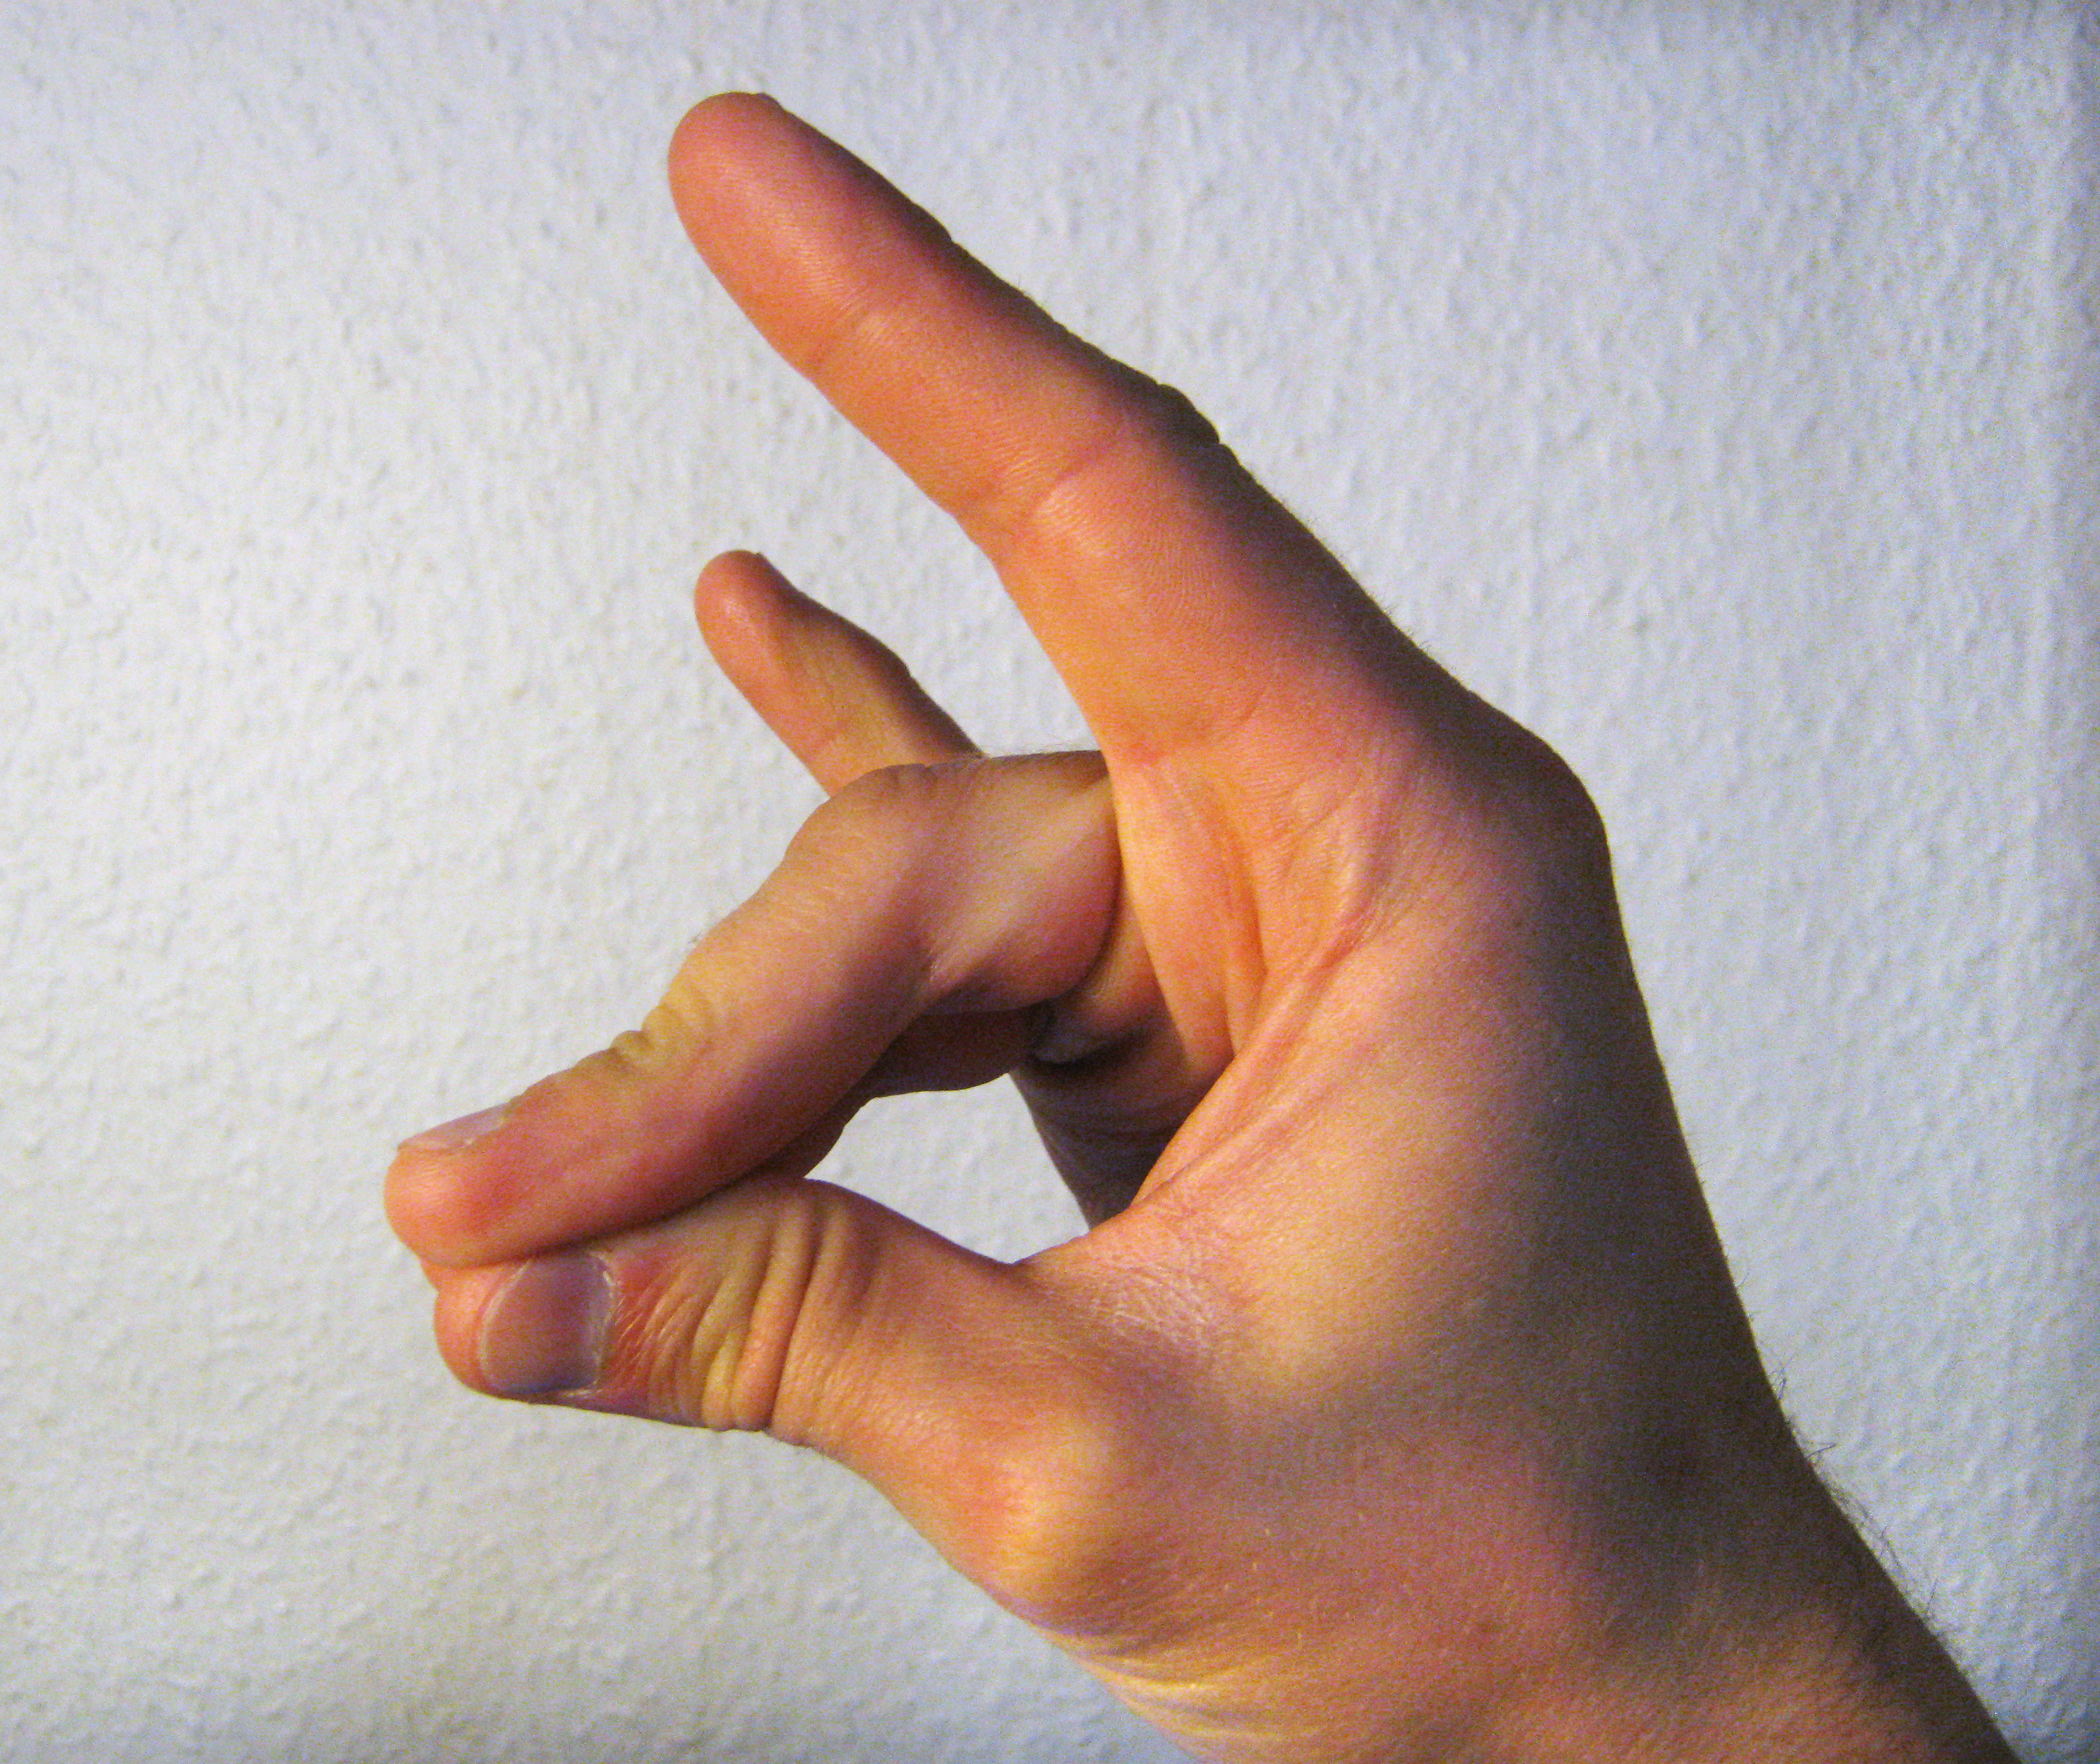 https://upload.wikimedia.org/wikipedia/commons/c/cc/Schweigefuchs.jpg